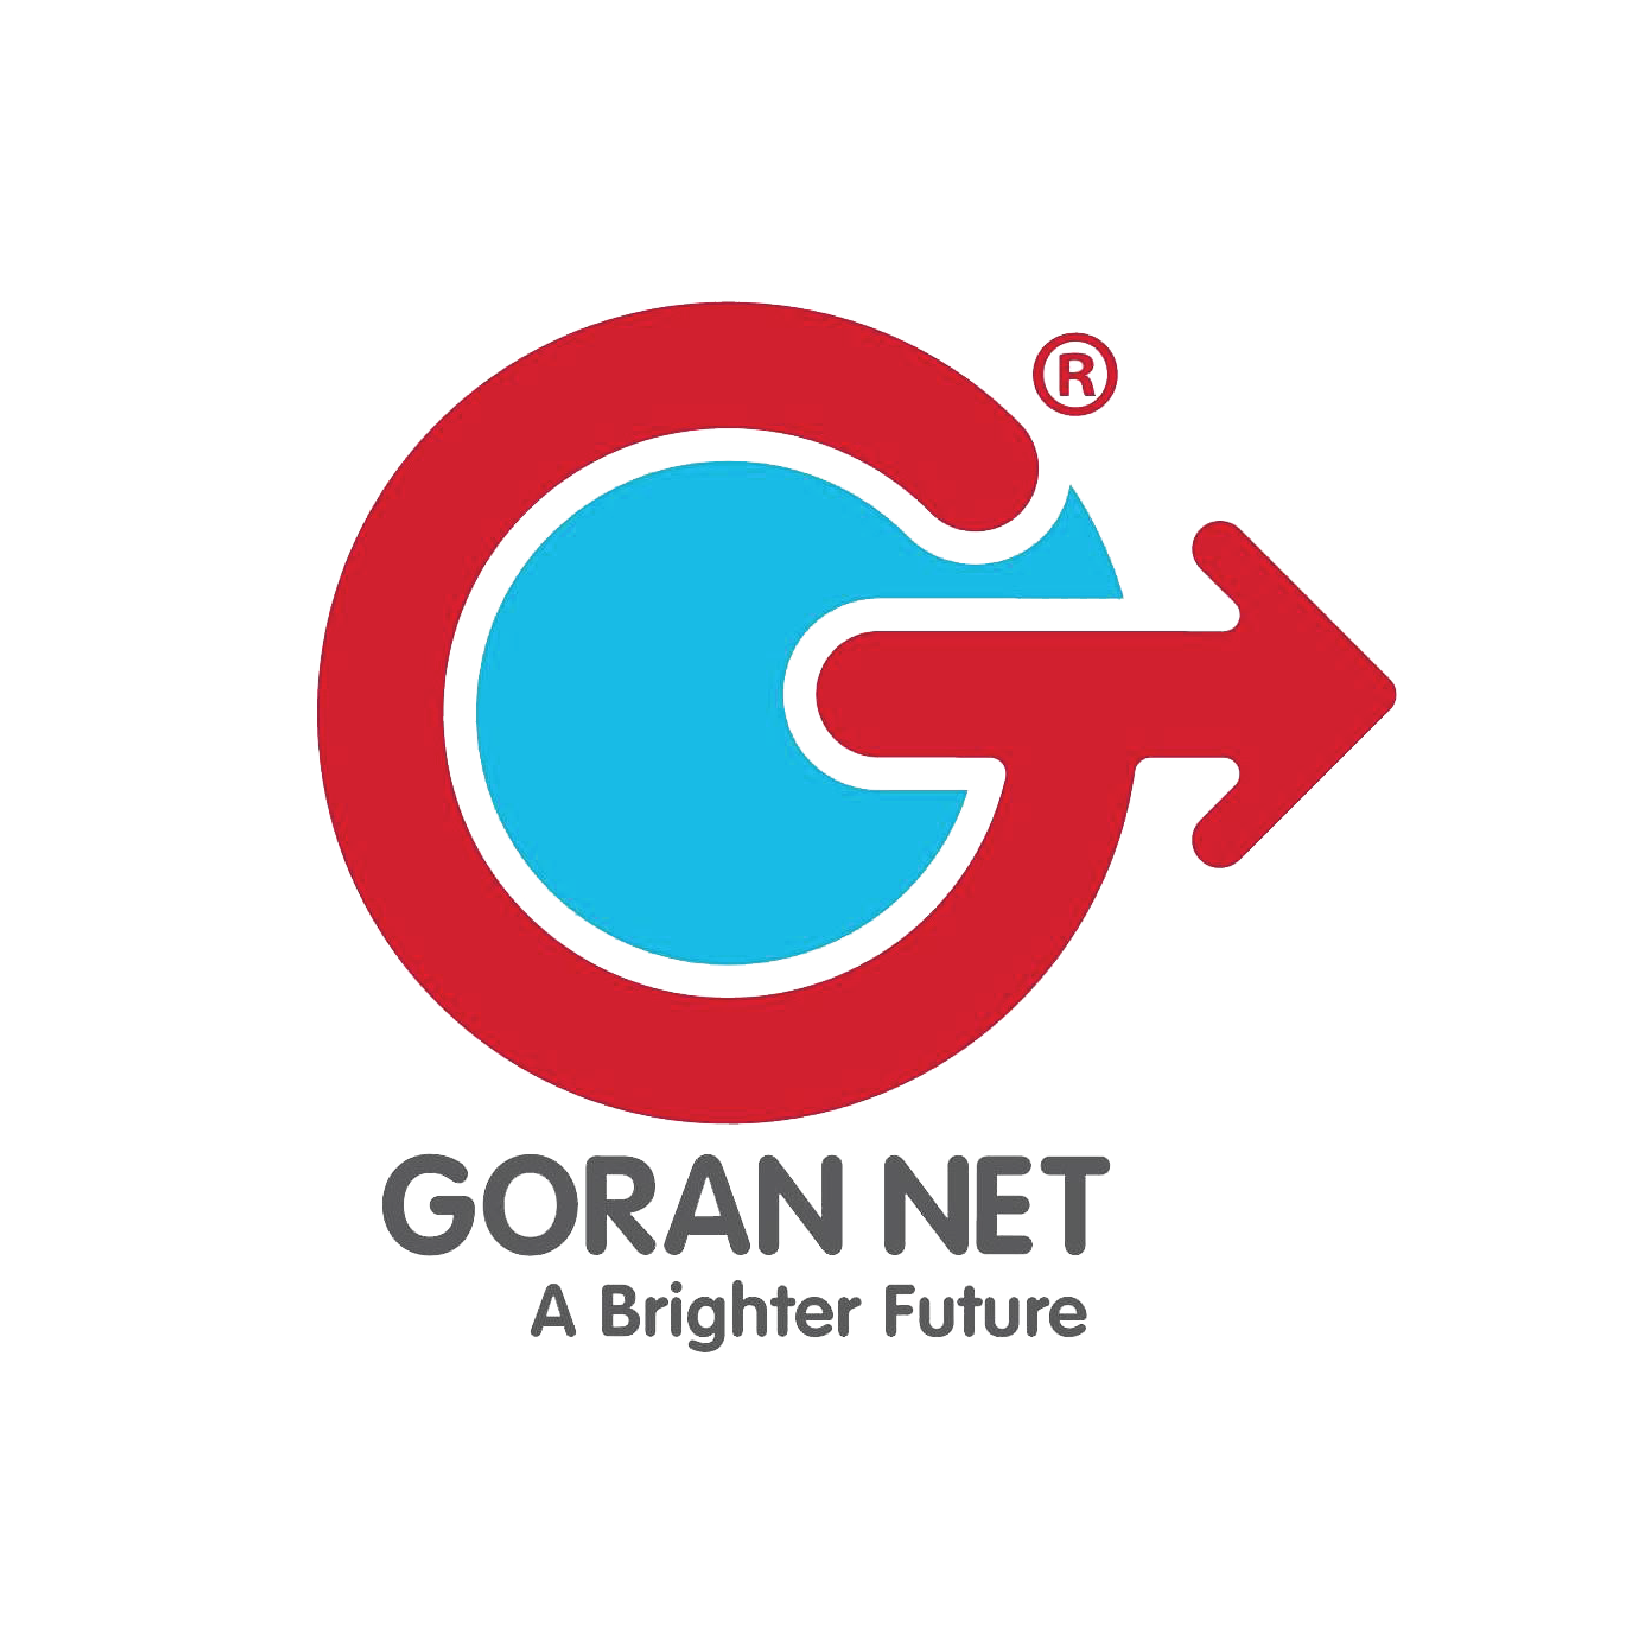 Gorannet